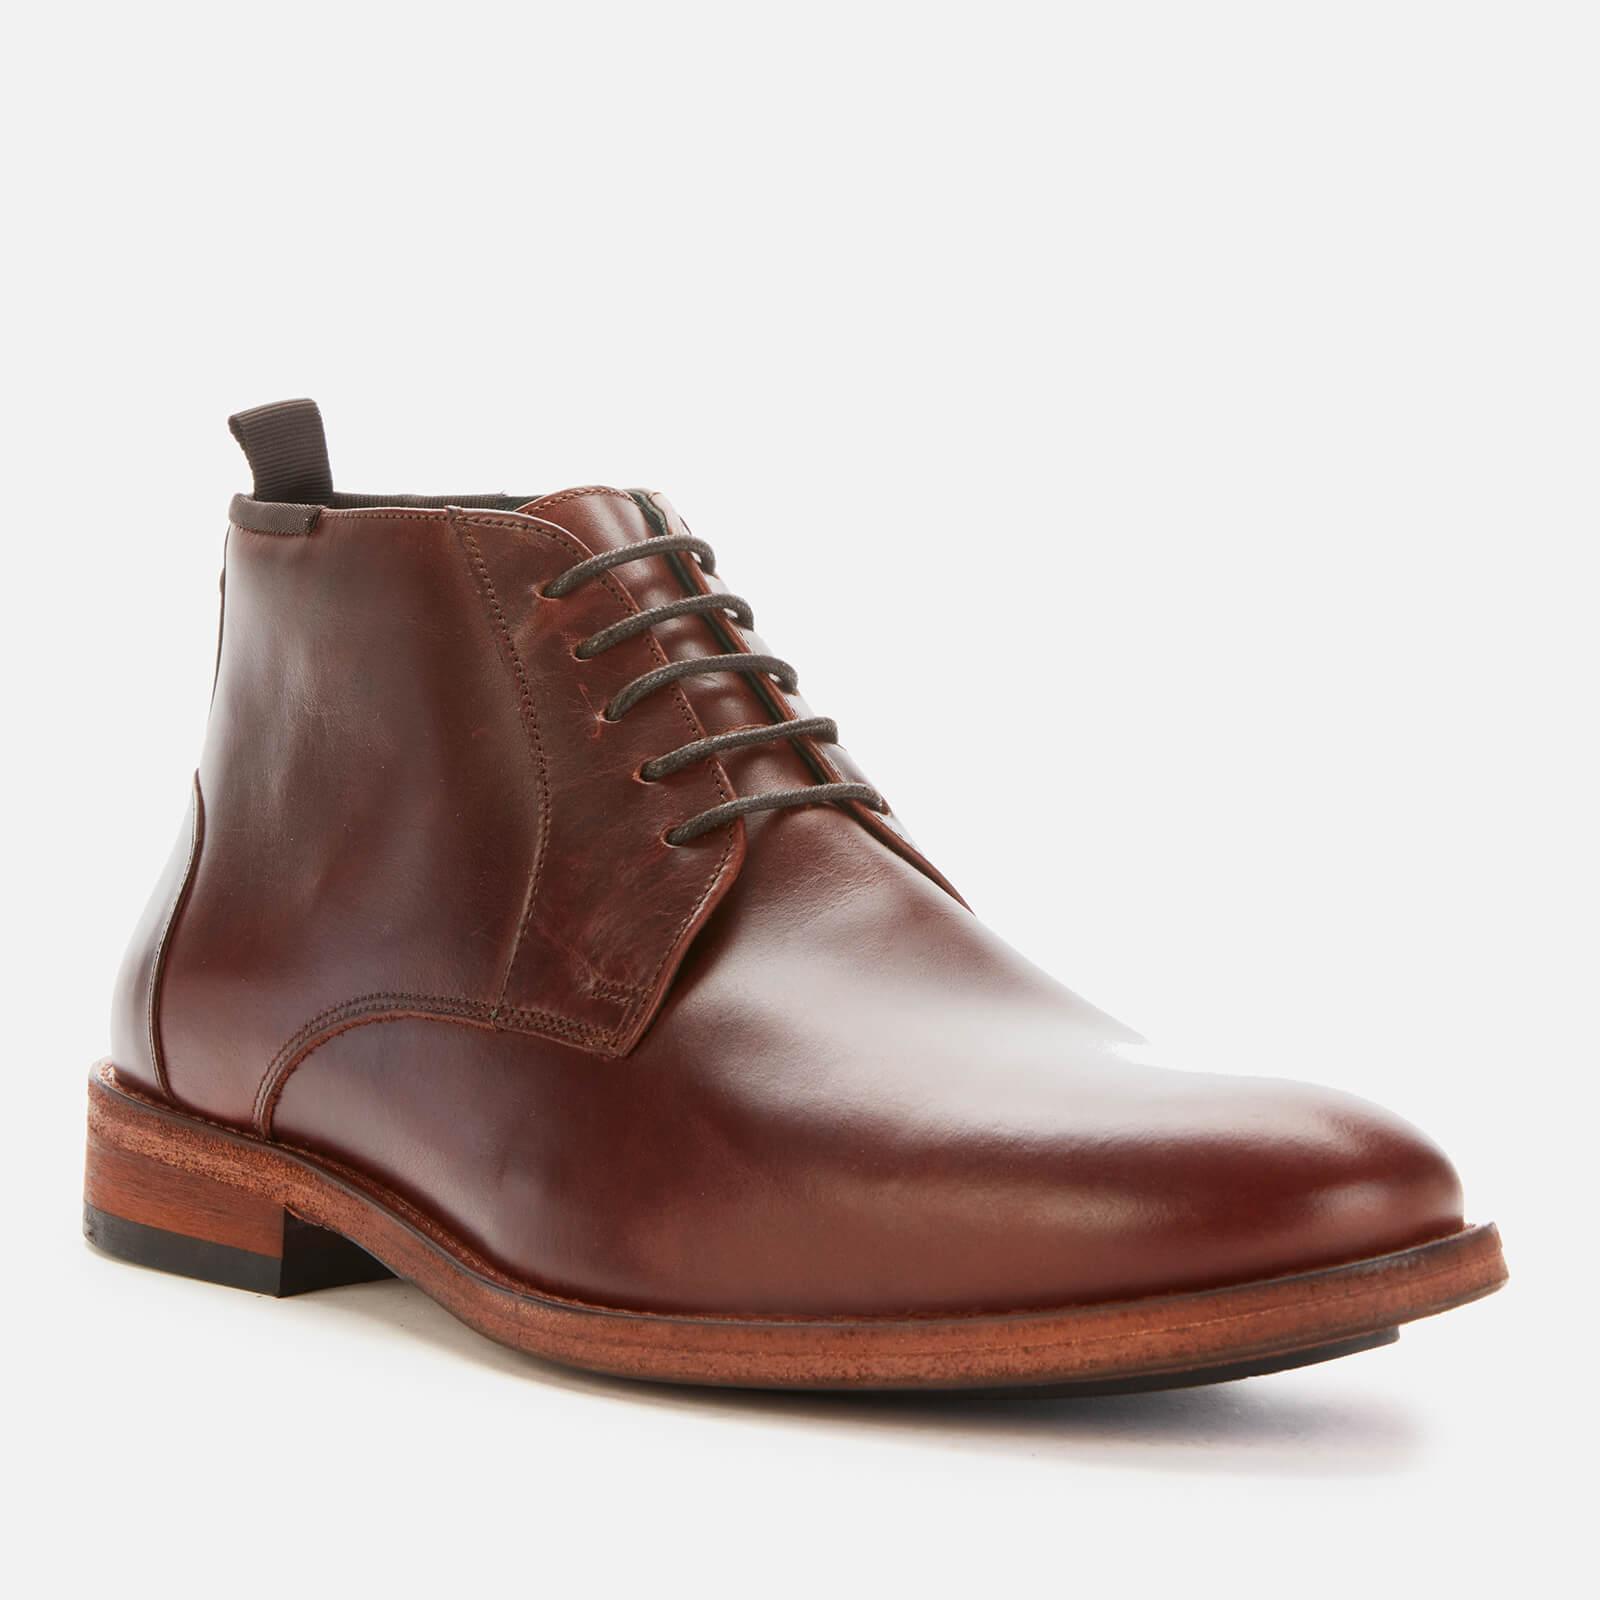 Barbour 巴伯尔 Benwell Chukka 男士短靴